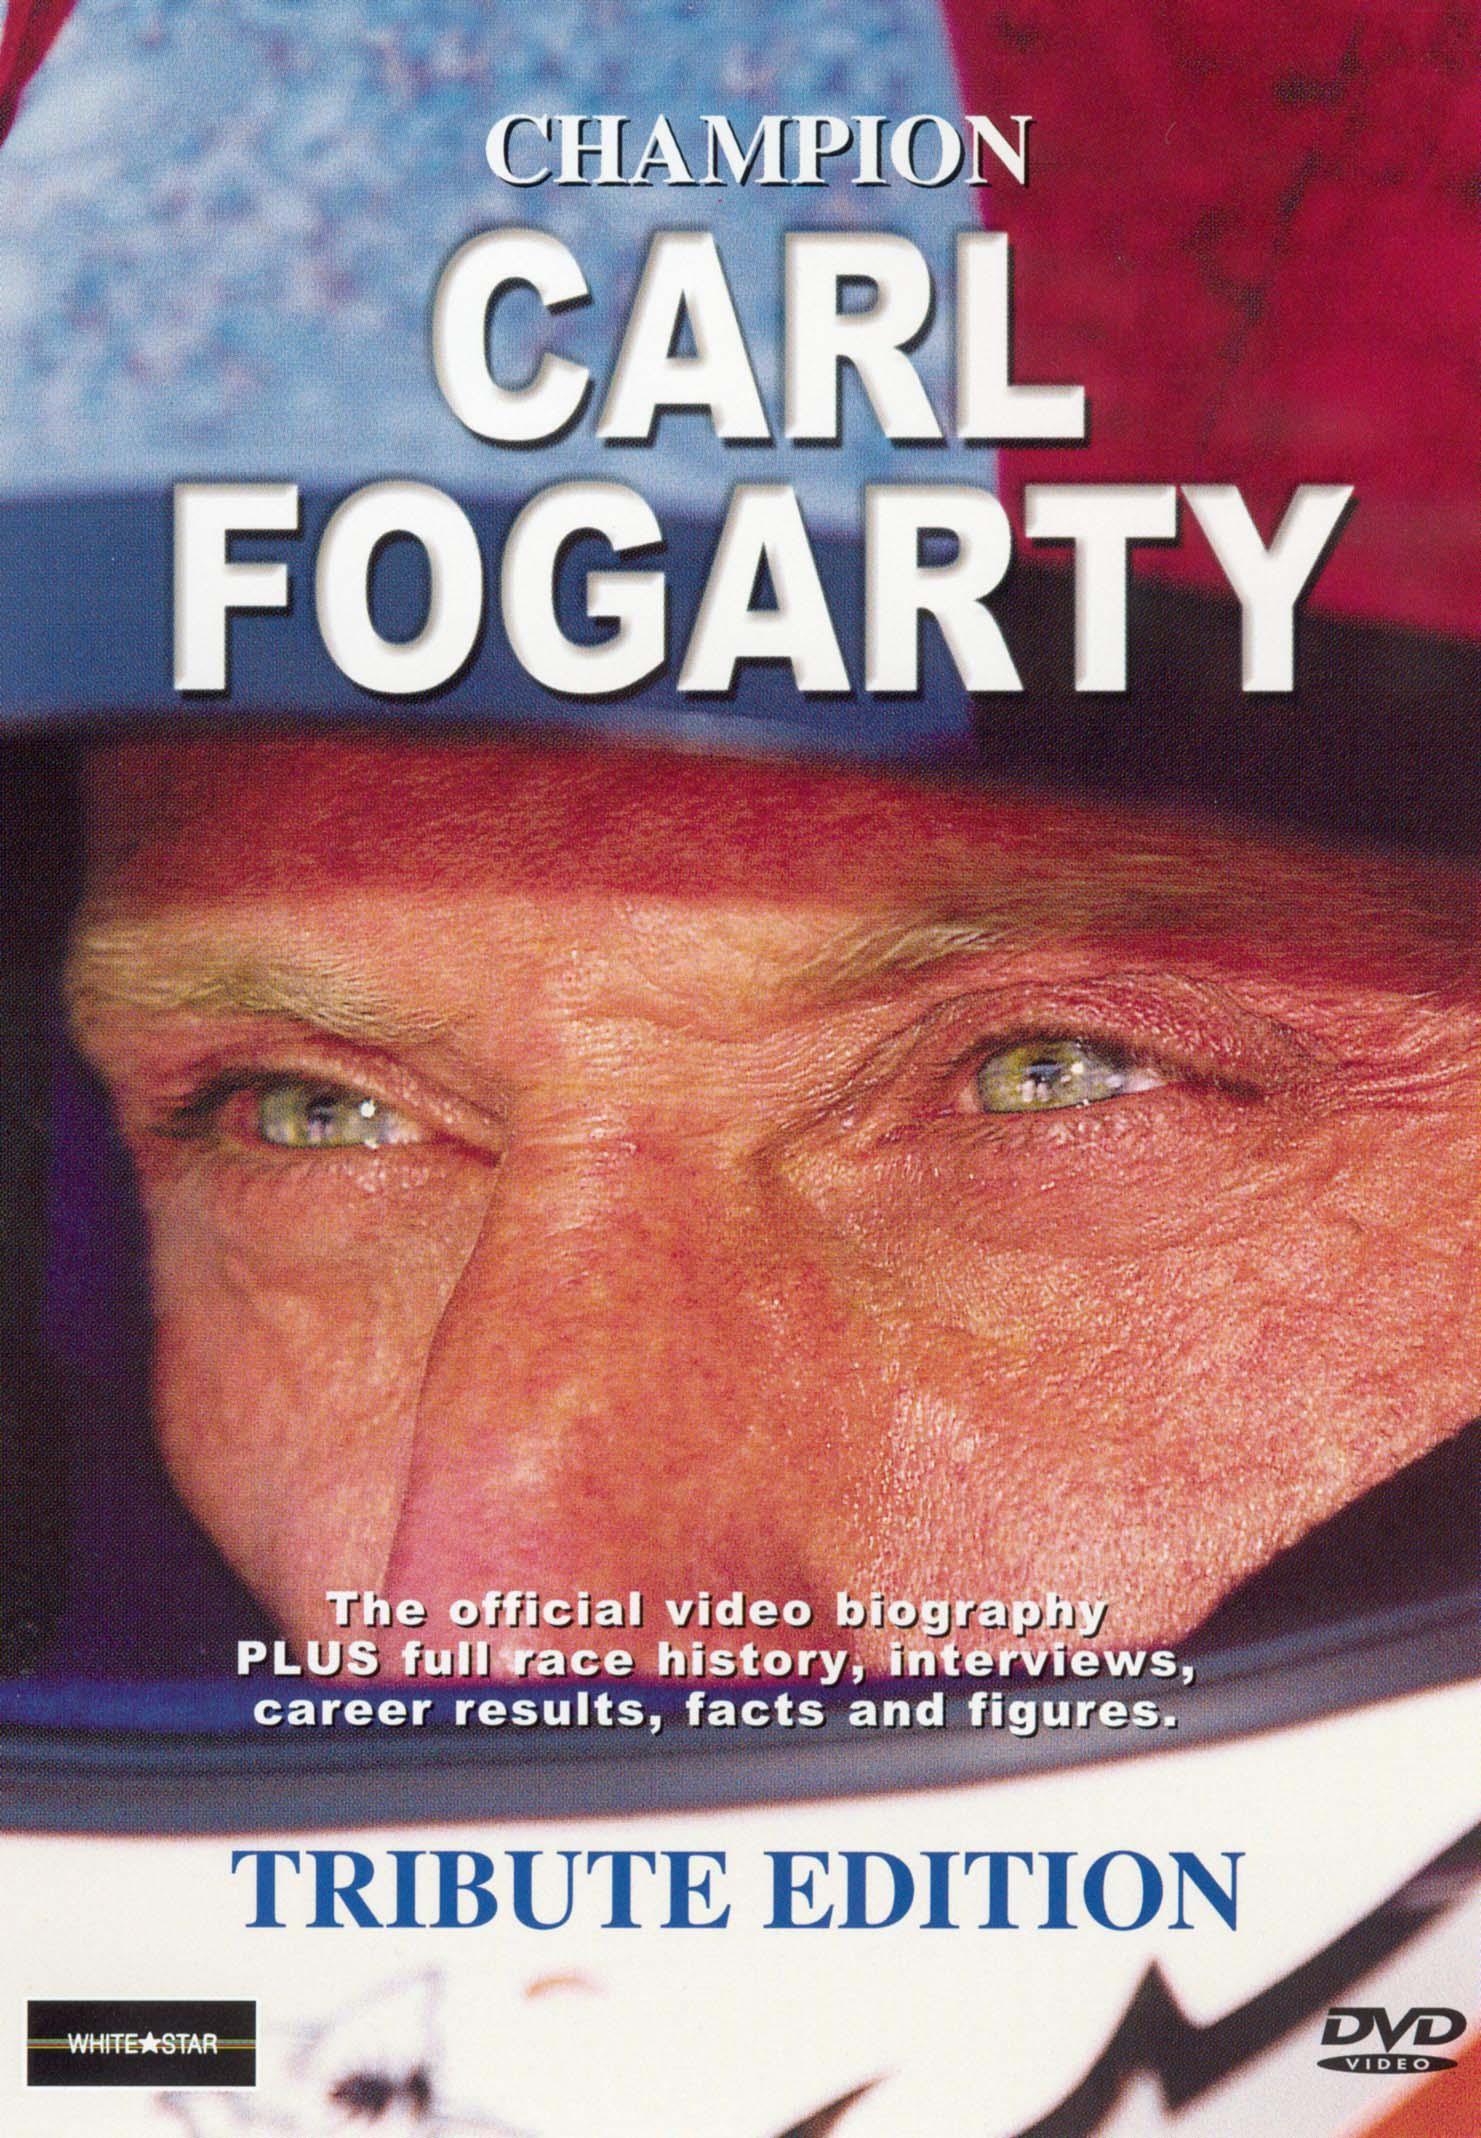 Champion Carl Fogarty